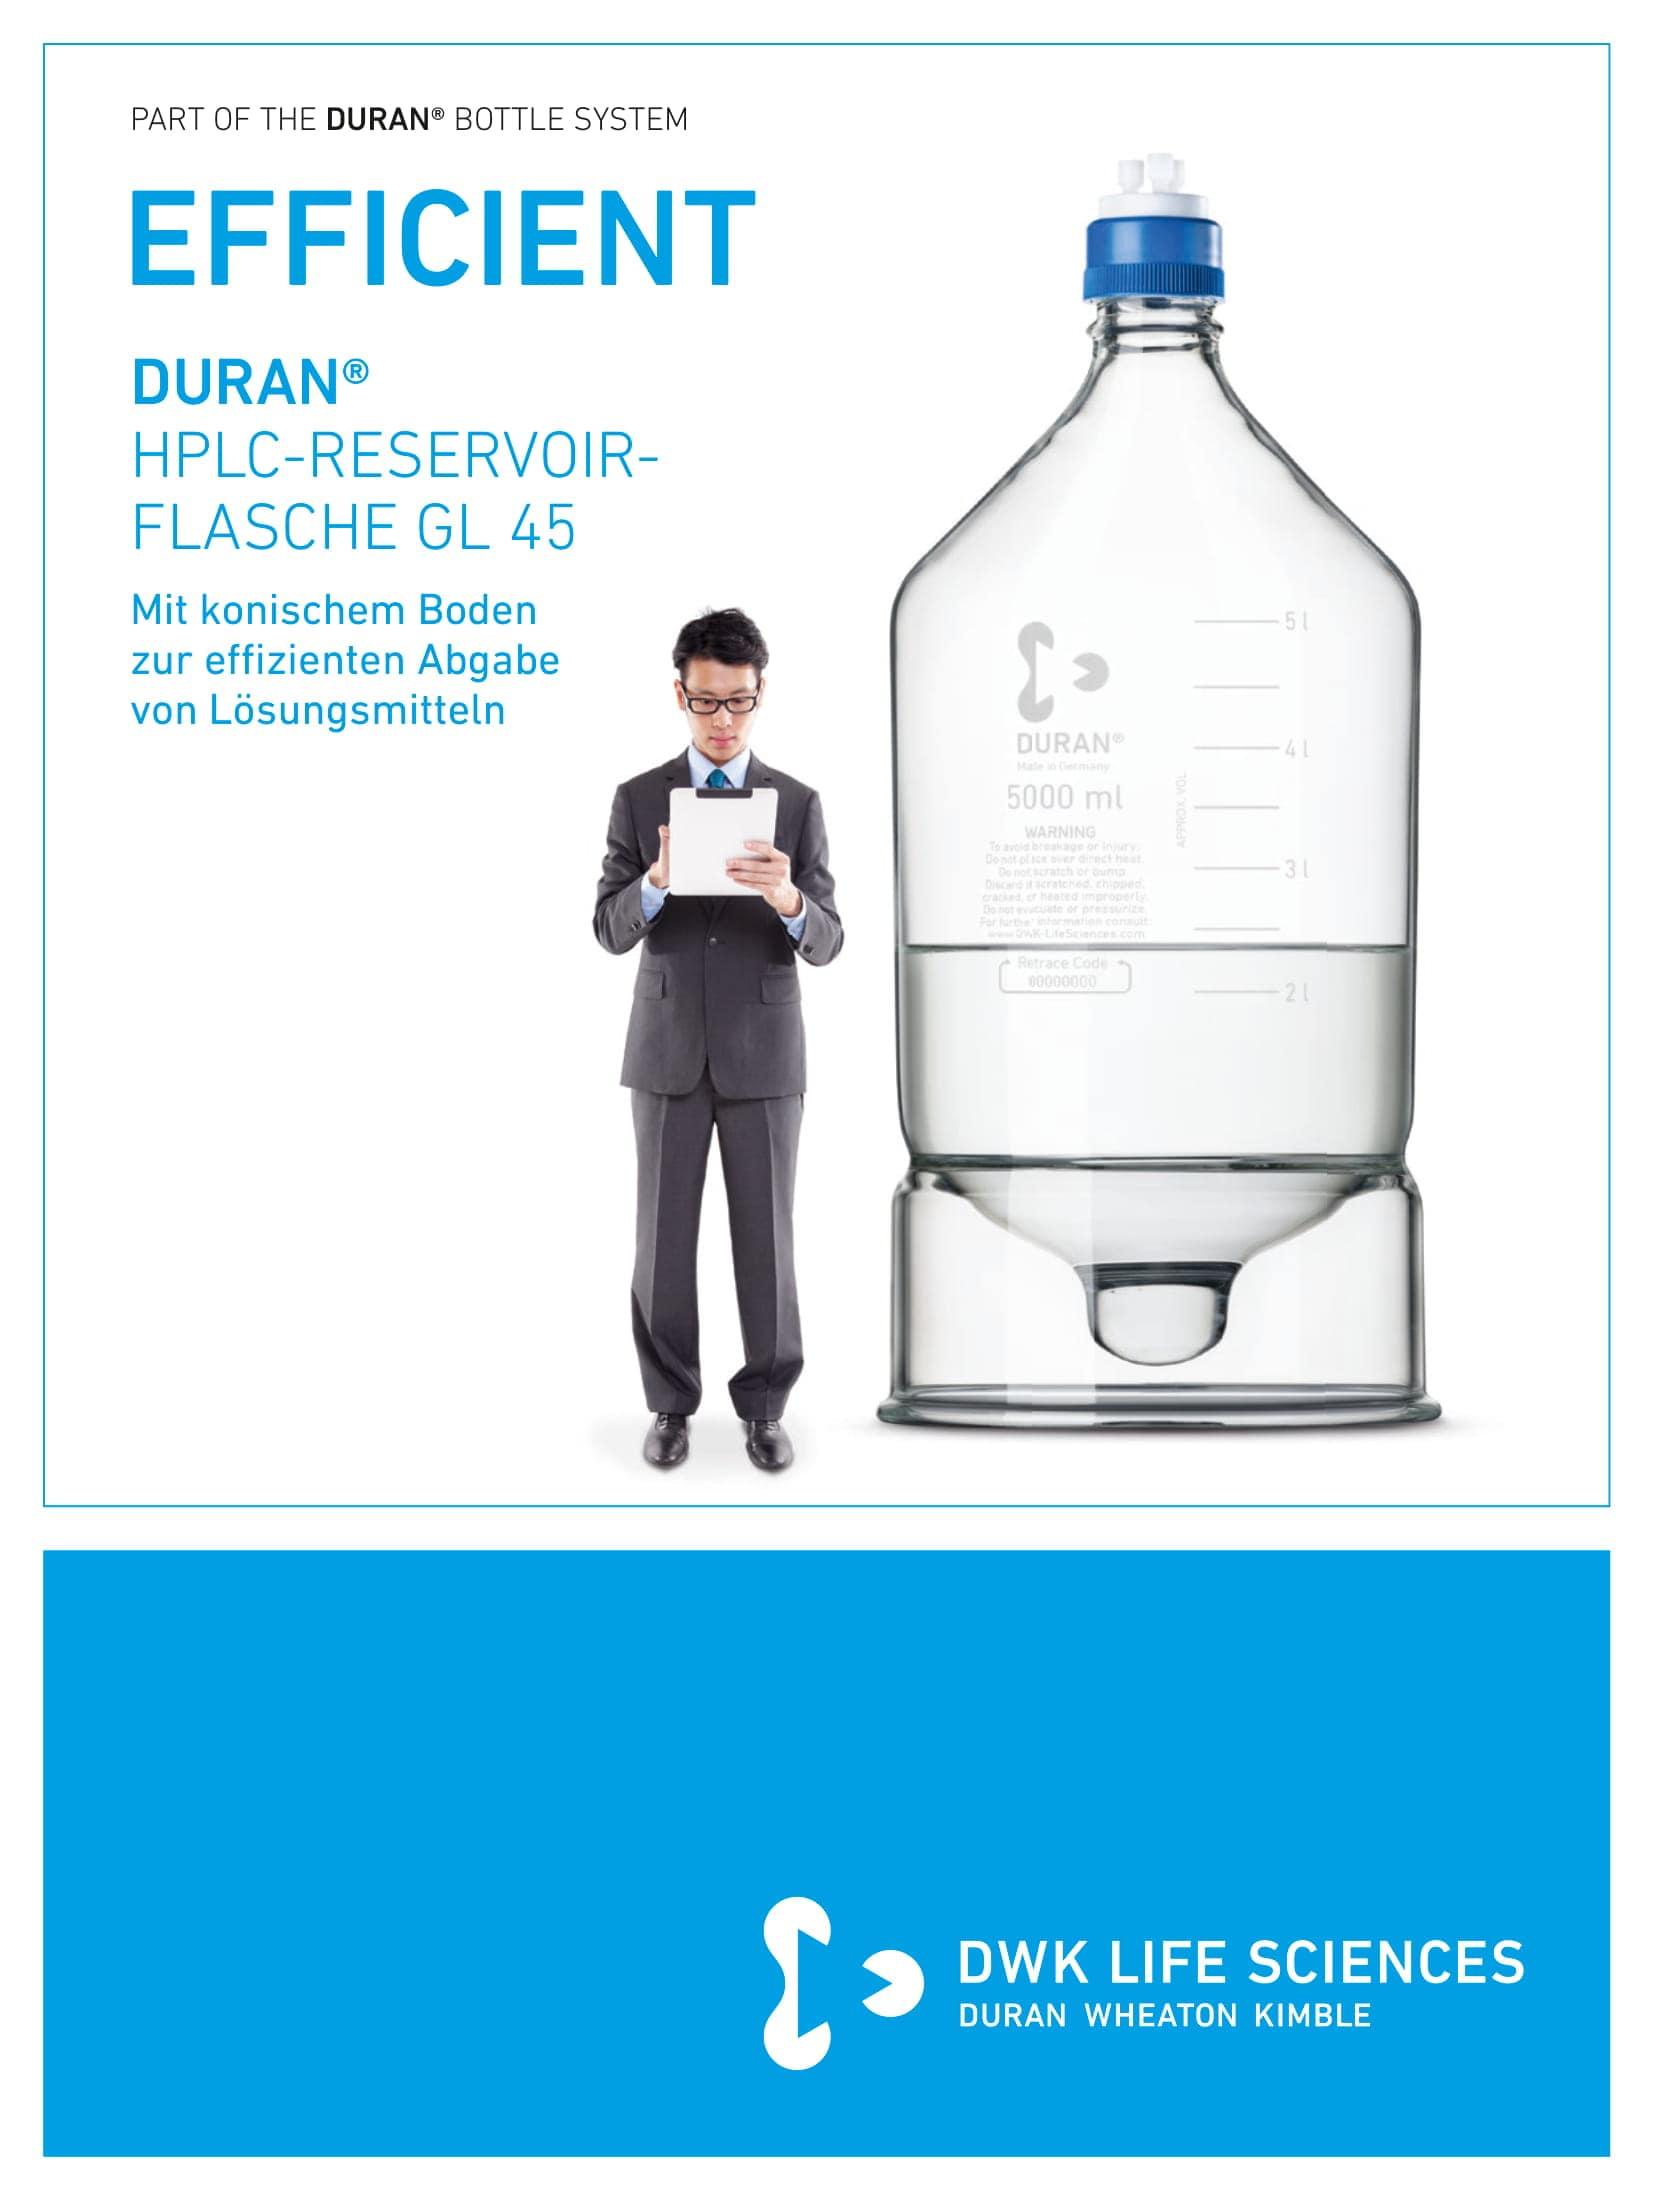 DURAN® HPLC Reservoir Bottle GL 45 German